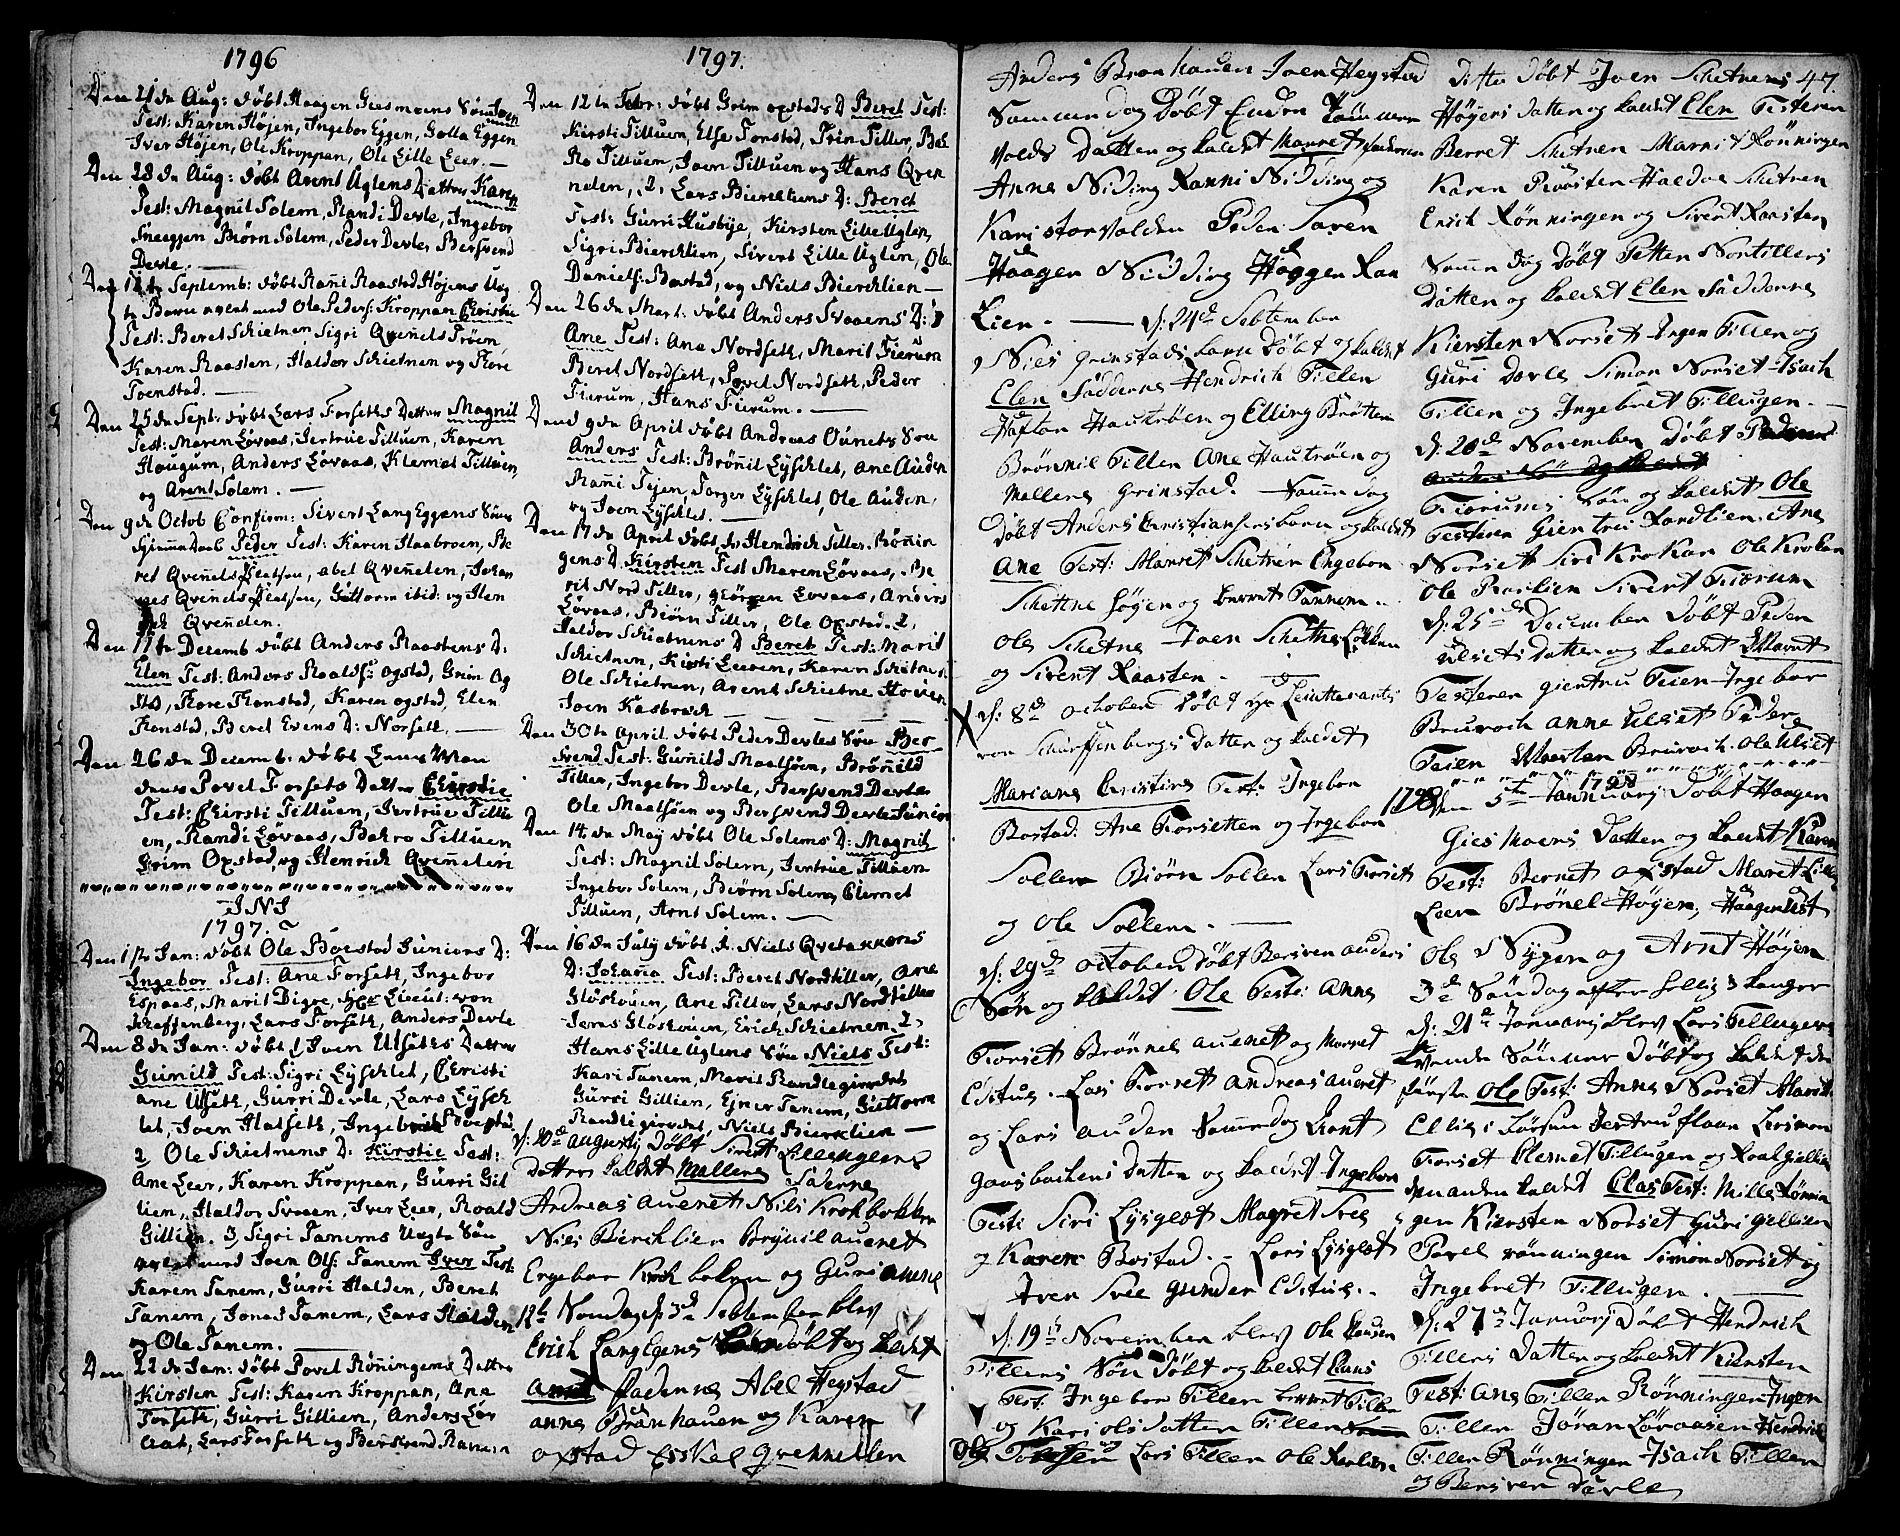 SAT, Ministerialprotokoller, klokkerbøker og fødselsregistre - Sør-Trøndelag, 618/L0438: Parish register (official) no. 618A03, 1783-1815, p. 47